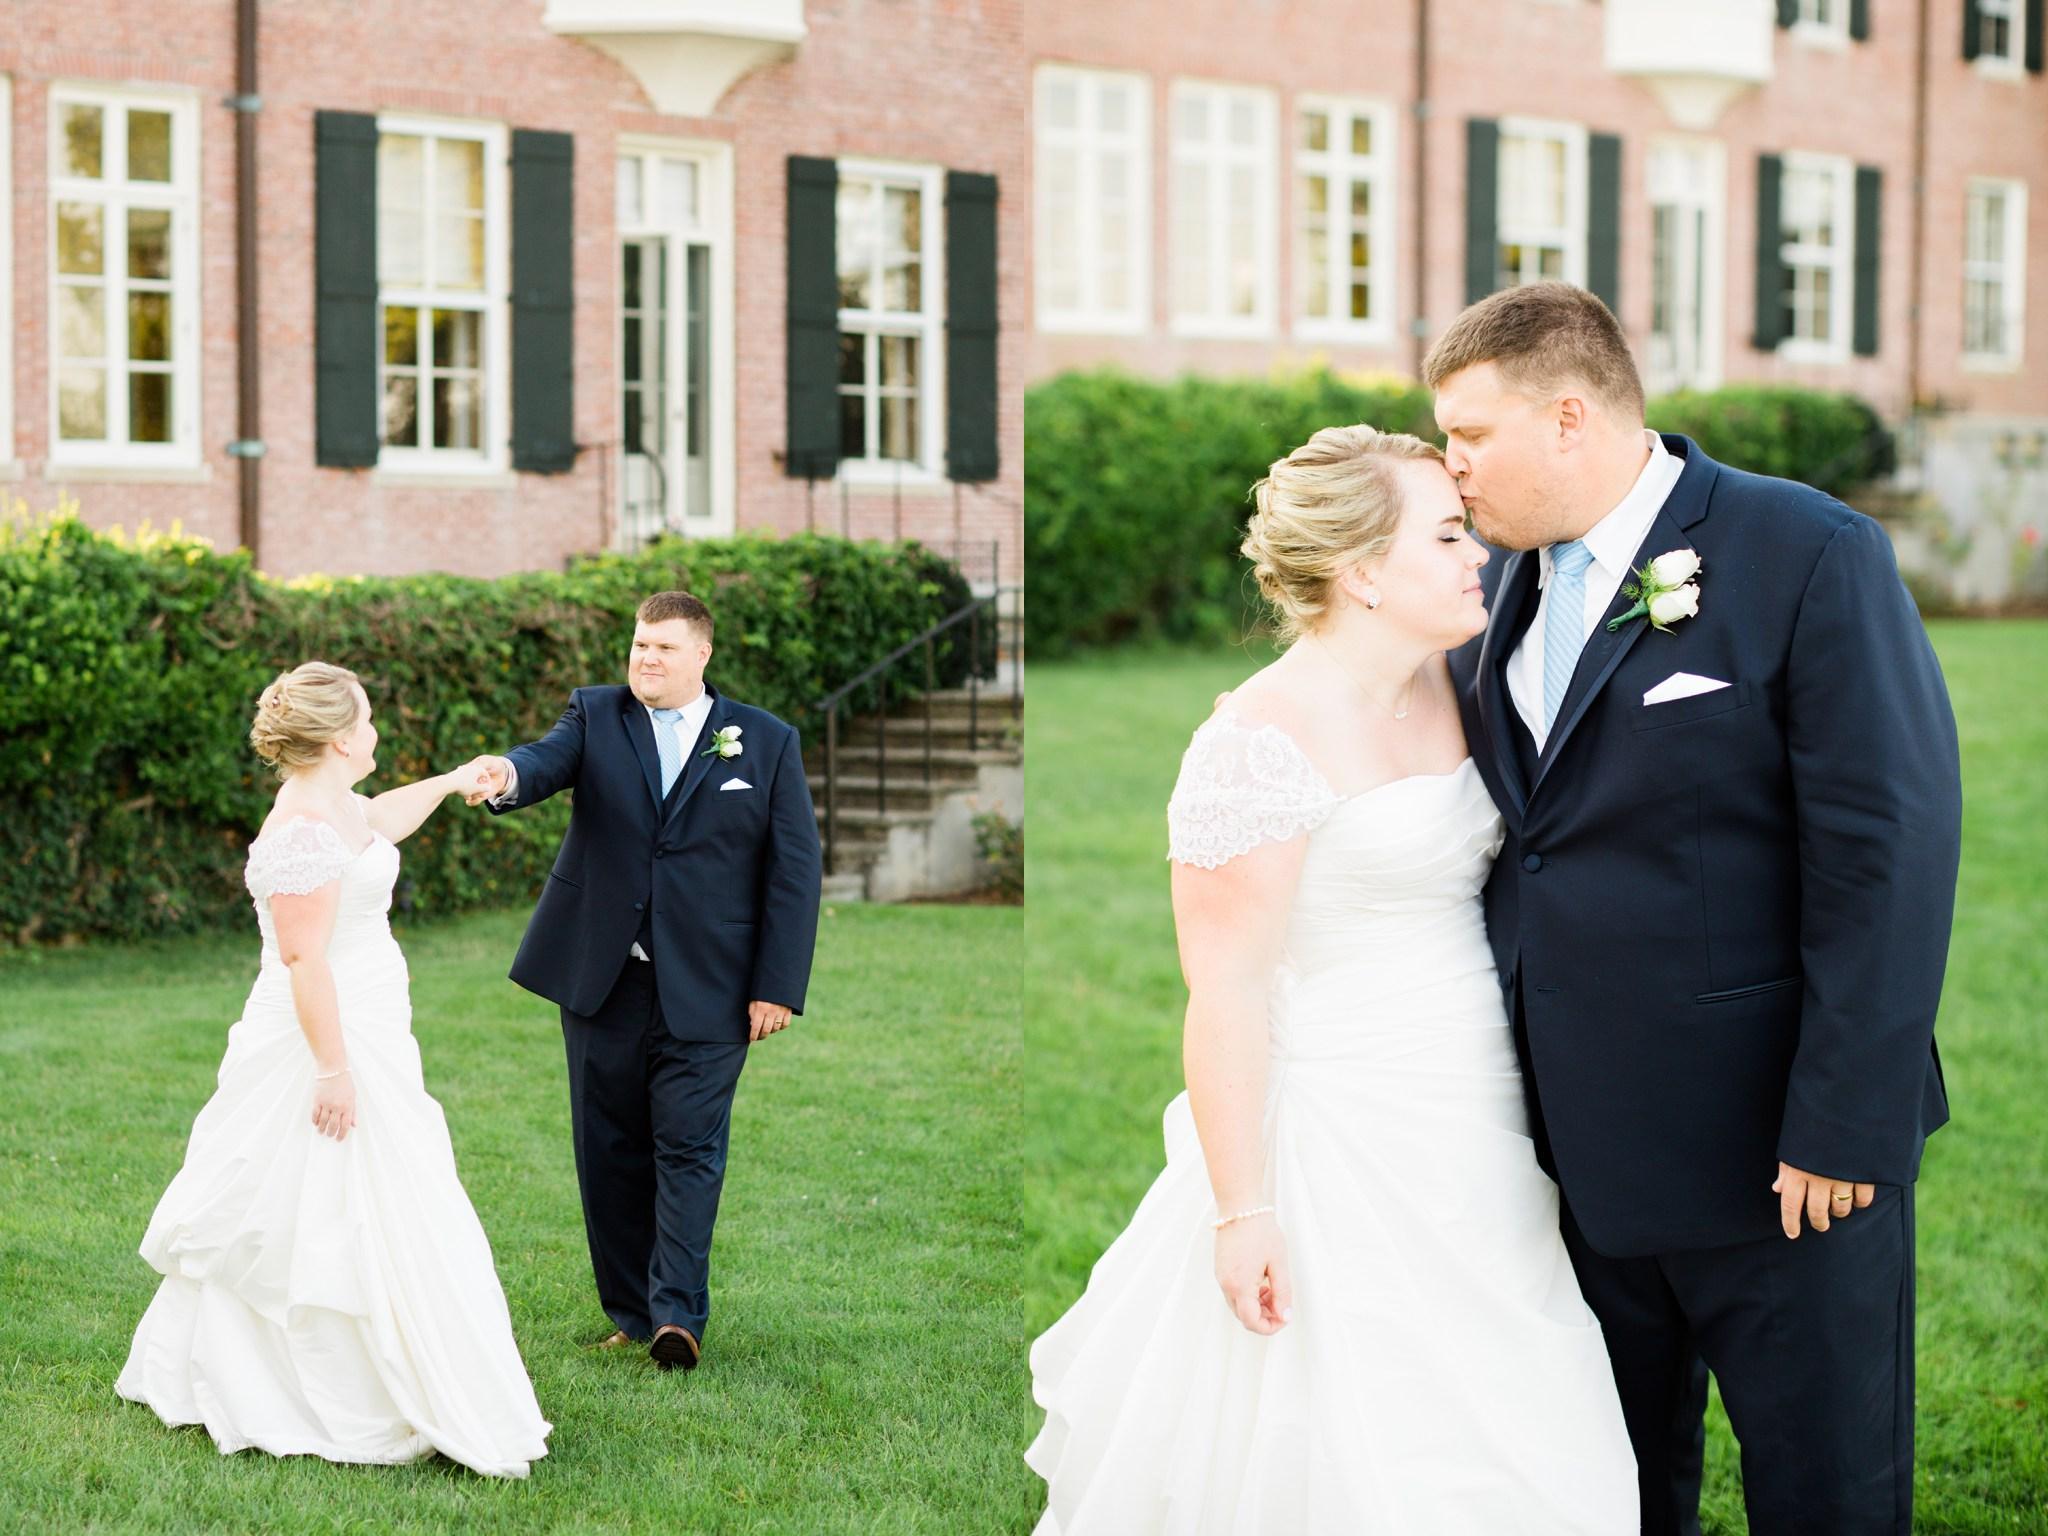 misselwood_endicott_college_wedding_photos_00077.JPG